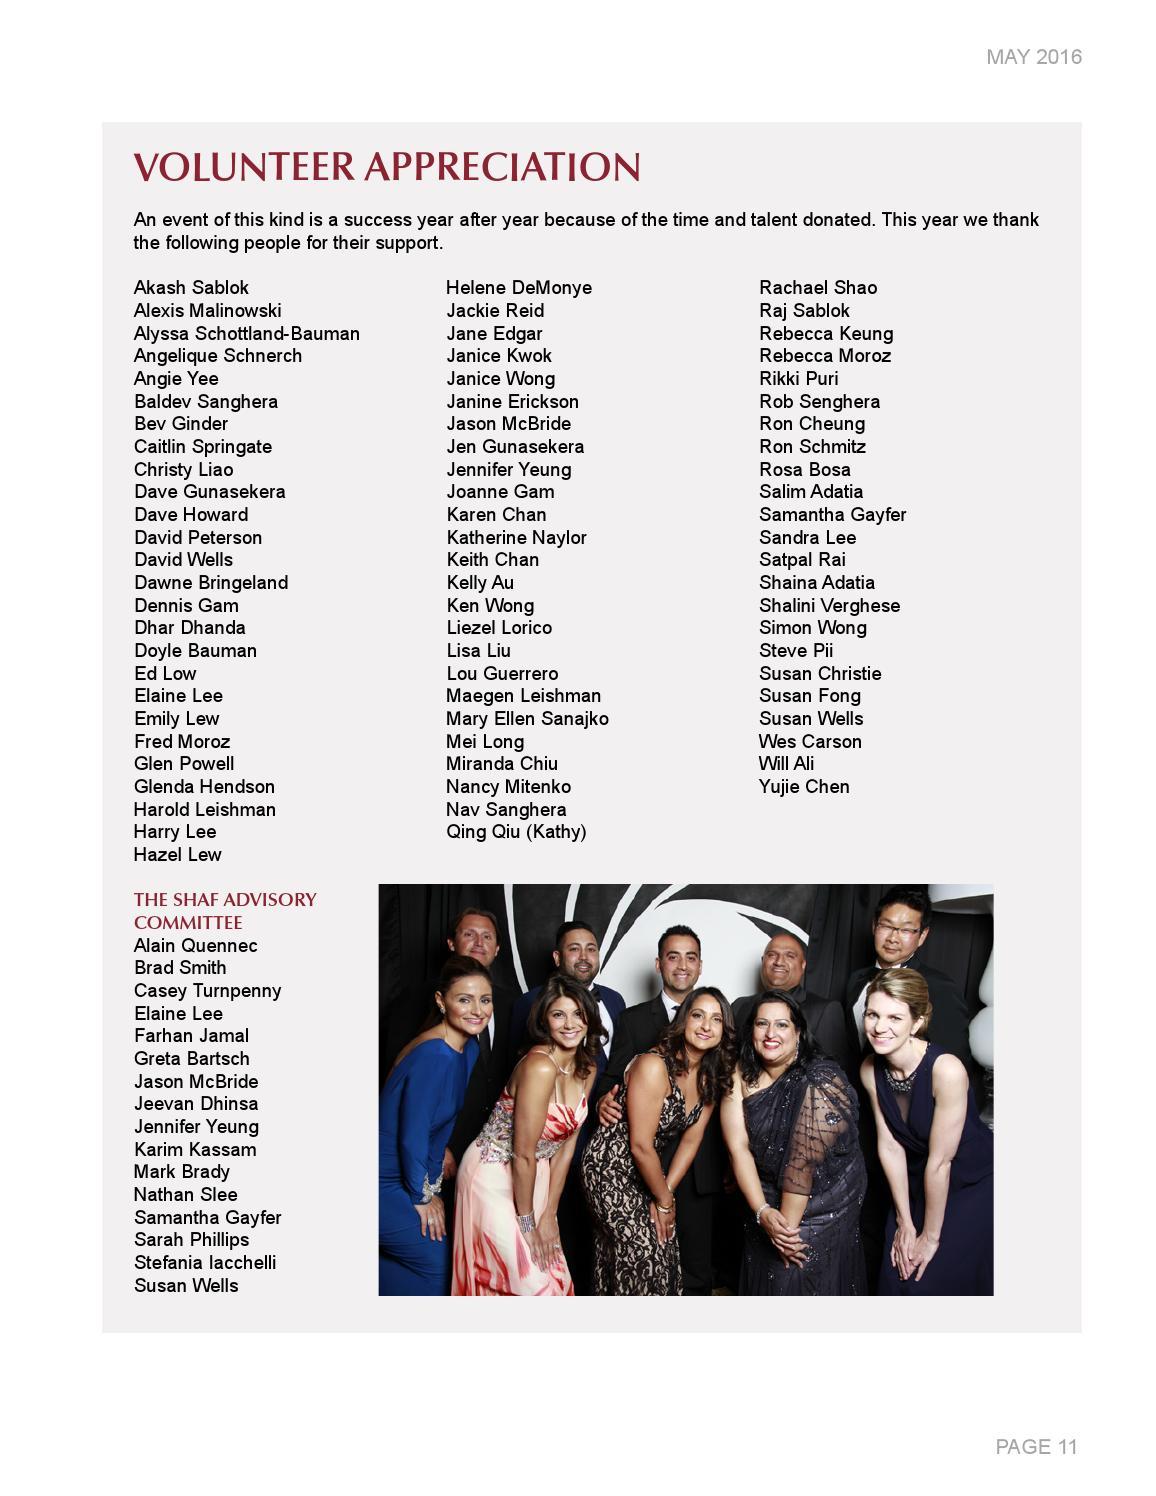 Kim Kardashian Upskirt. 2018-2019 celebrityes photos leaks!,Kendall jenner love magazine 2019 Porno archive Maitland Ward Braless. 2018-2019 celebrityes photos leaks!,Eefje sjokz depoortere